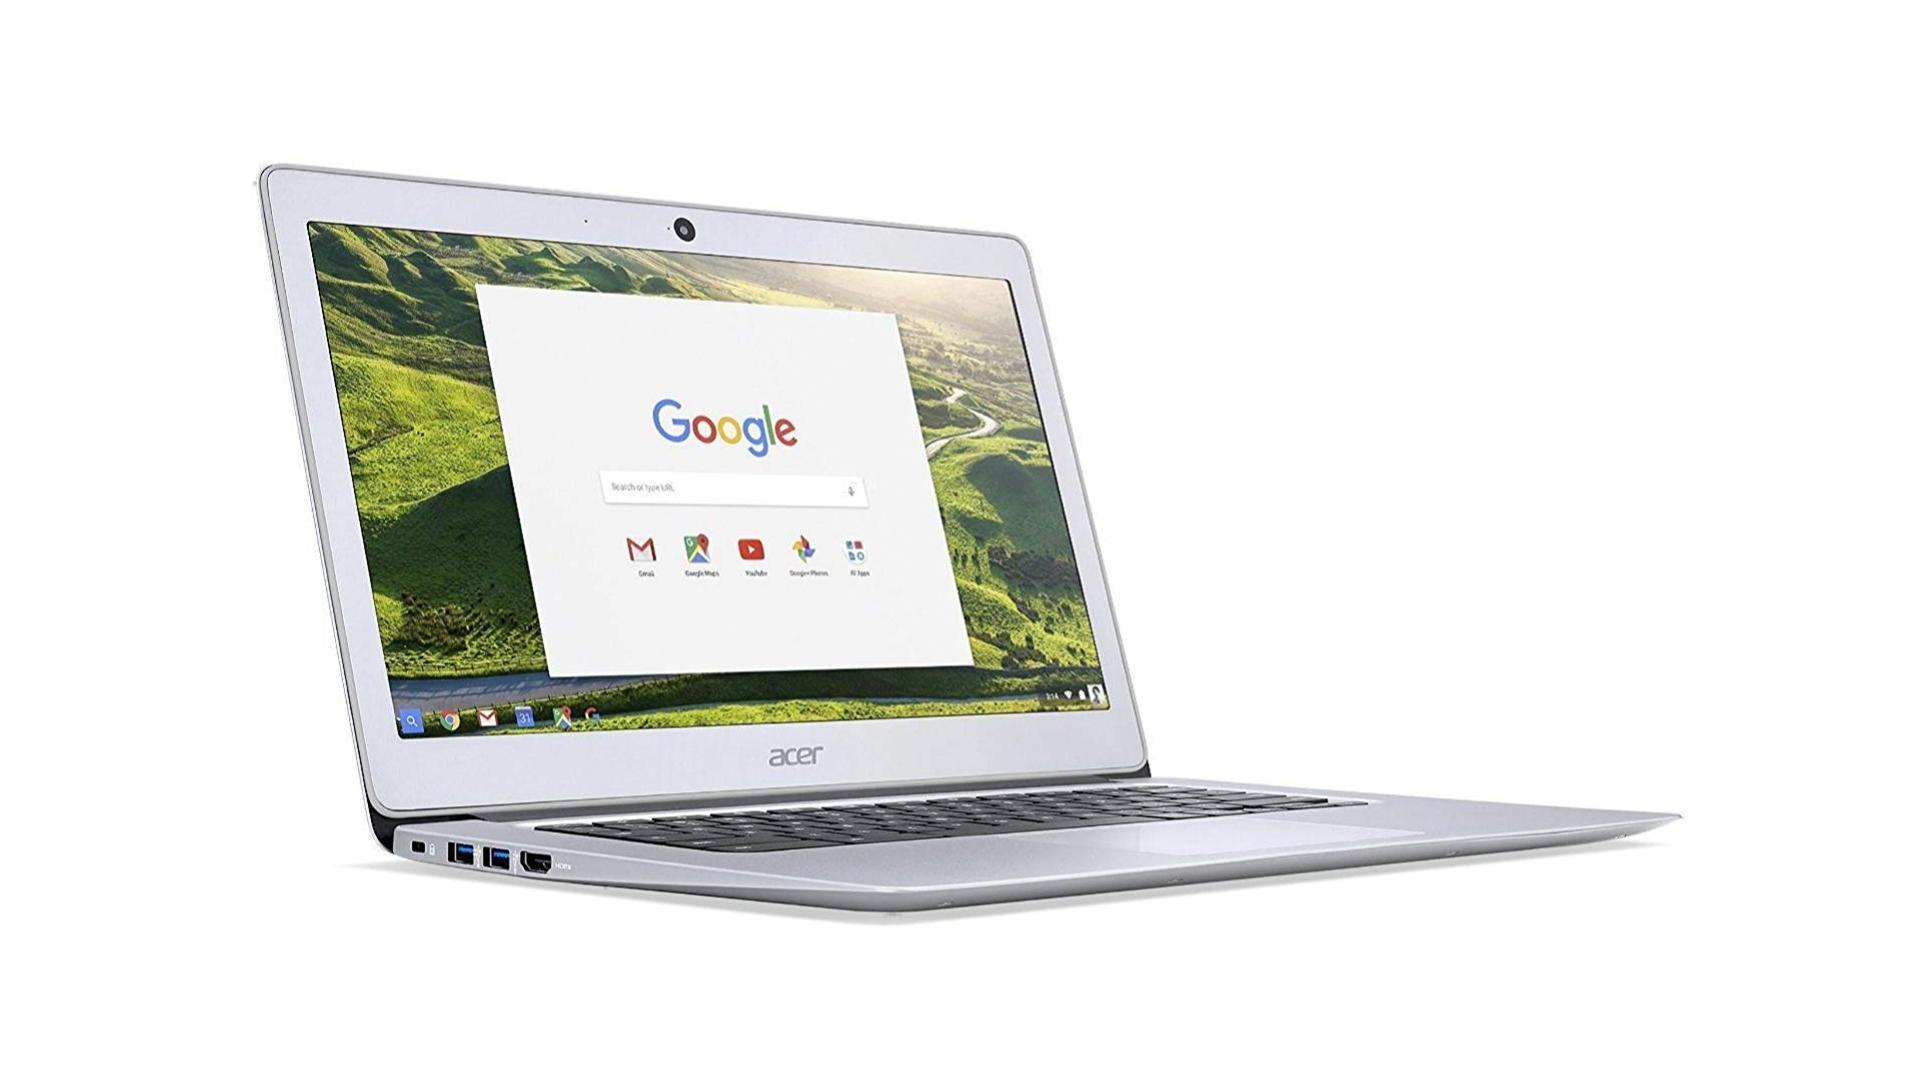 🔥 Black Friday : l'Acer Chromebook CB3 à 249 euros au lieu de 349 euros chez Amazon